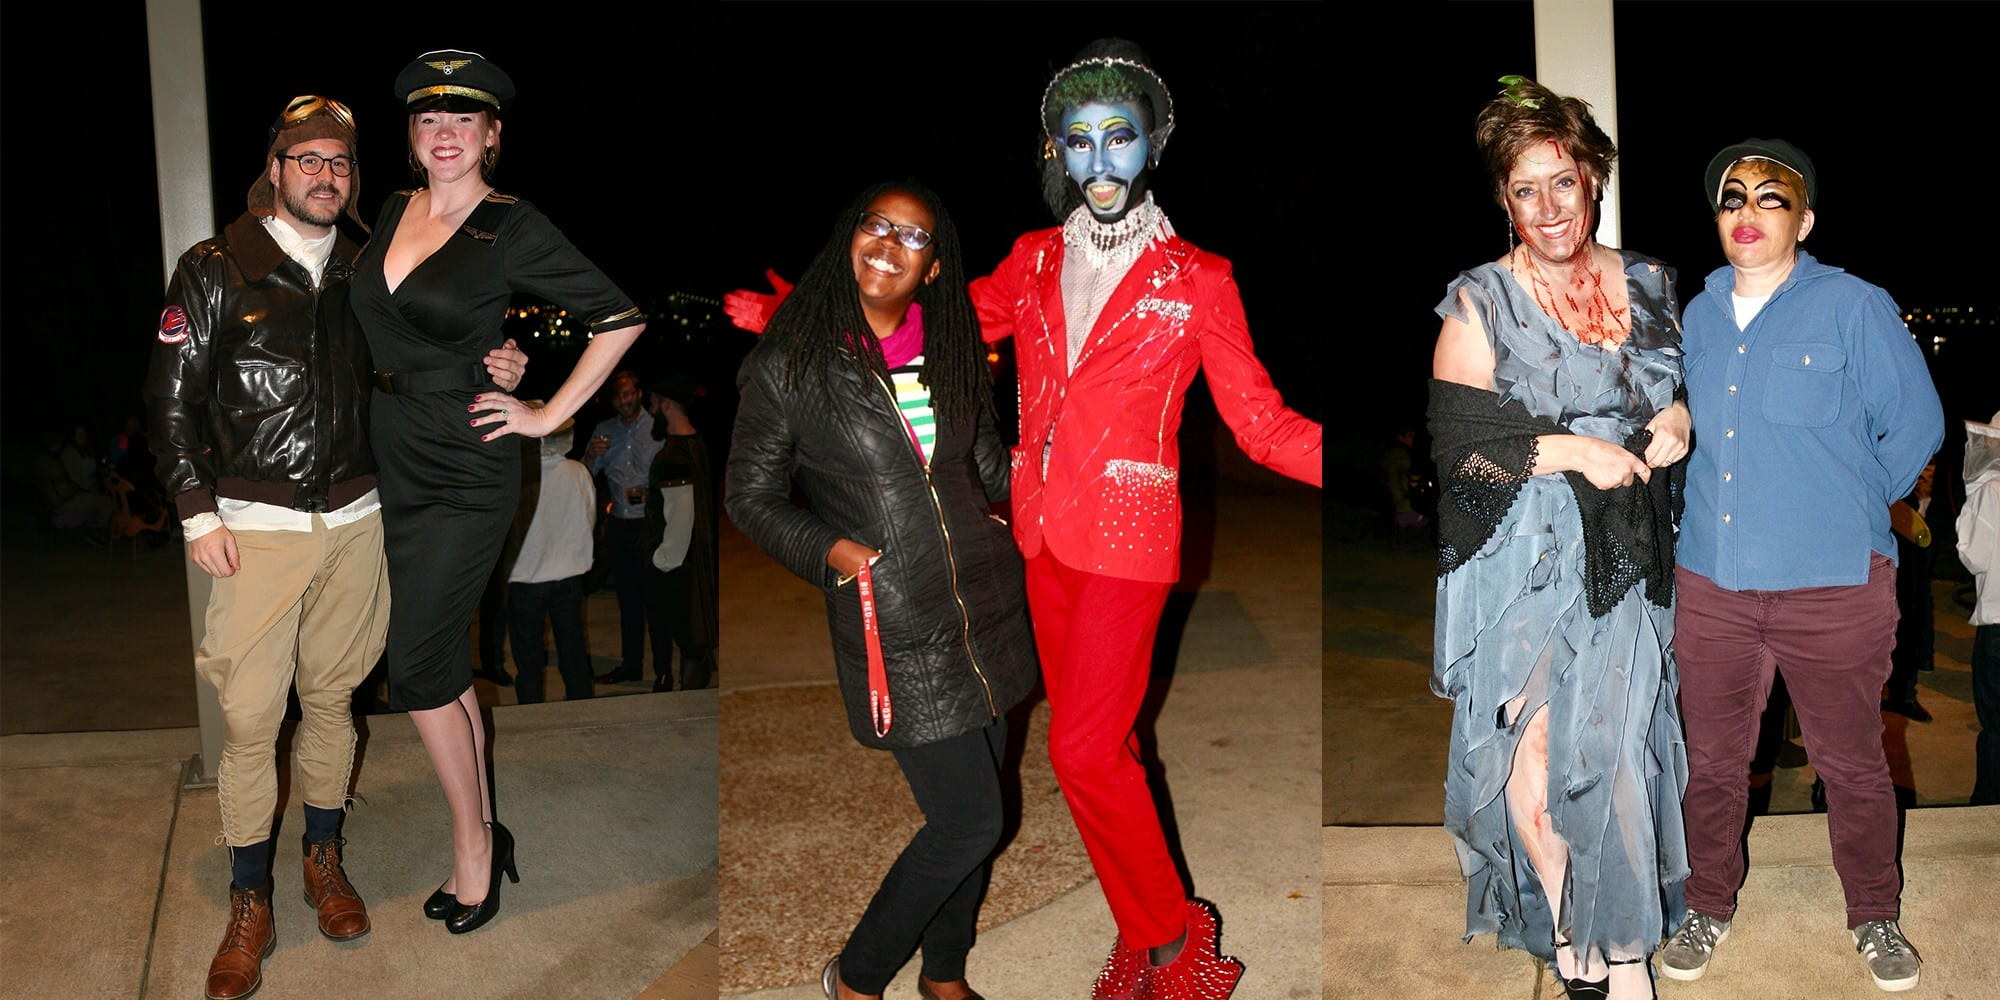 People at the Dutchtown Karneval.